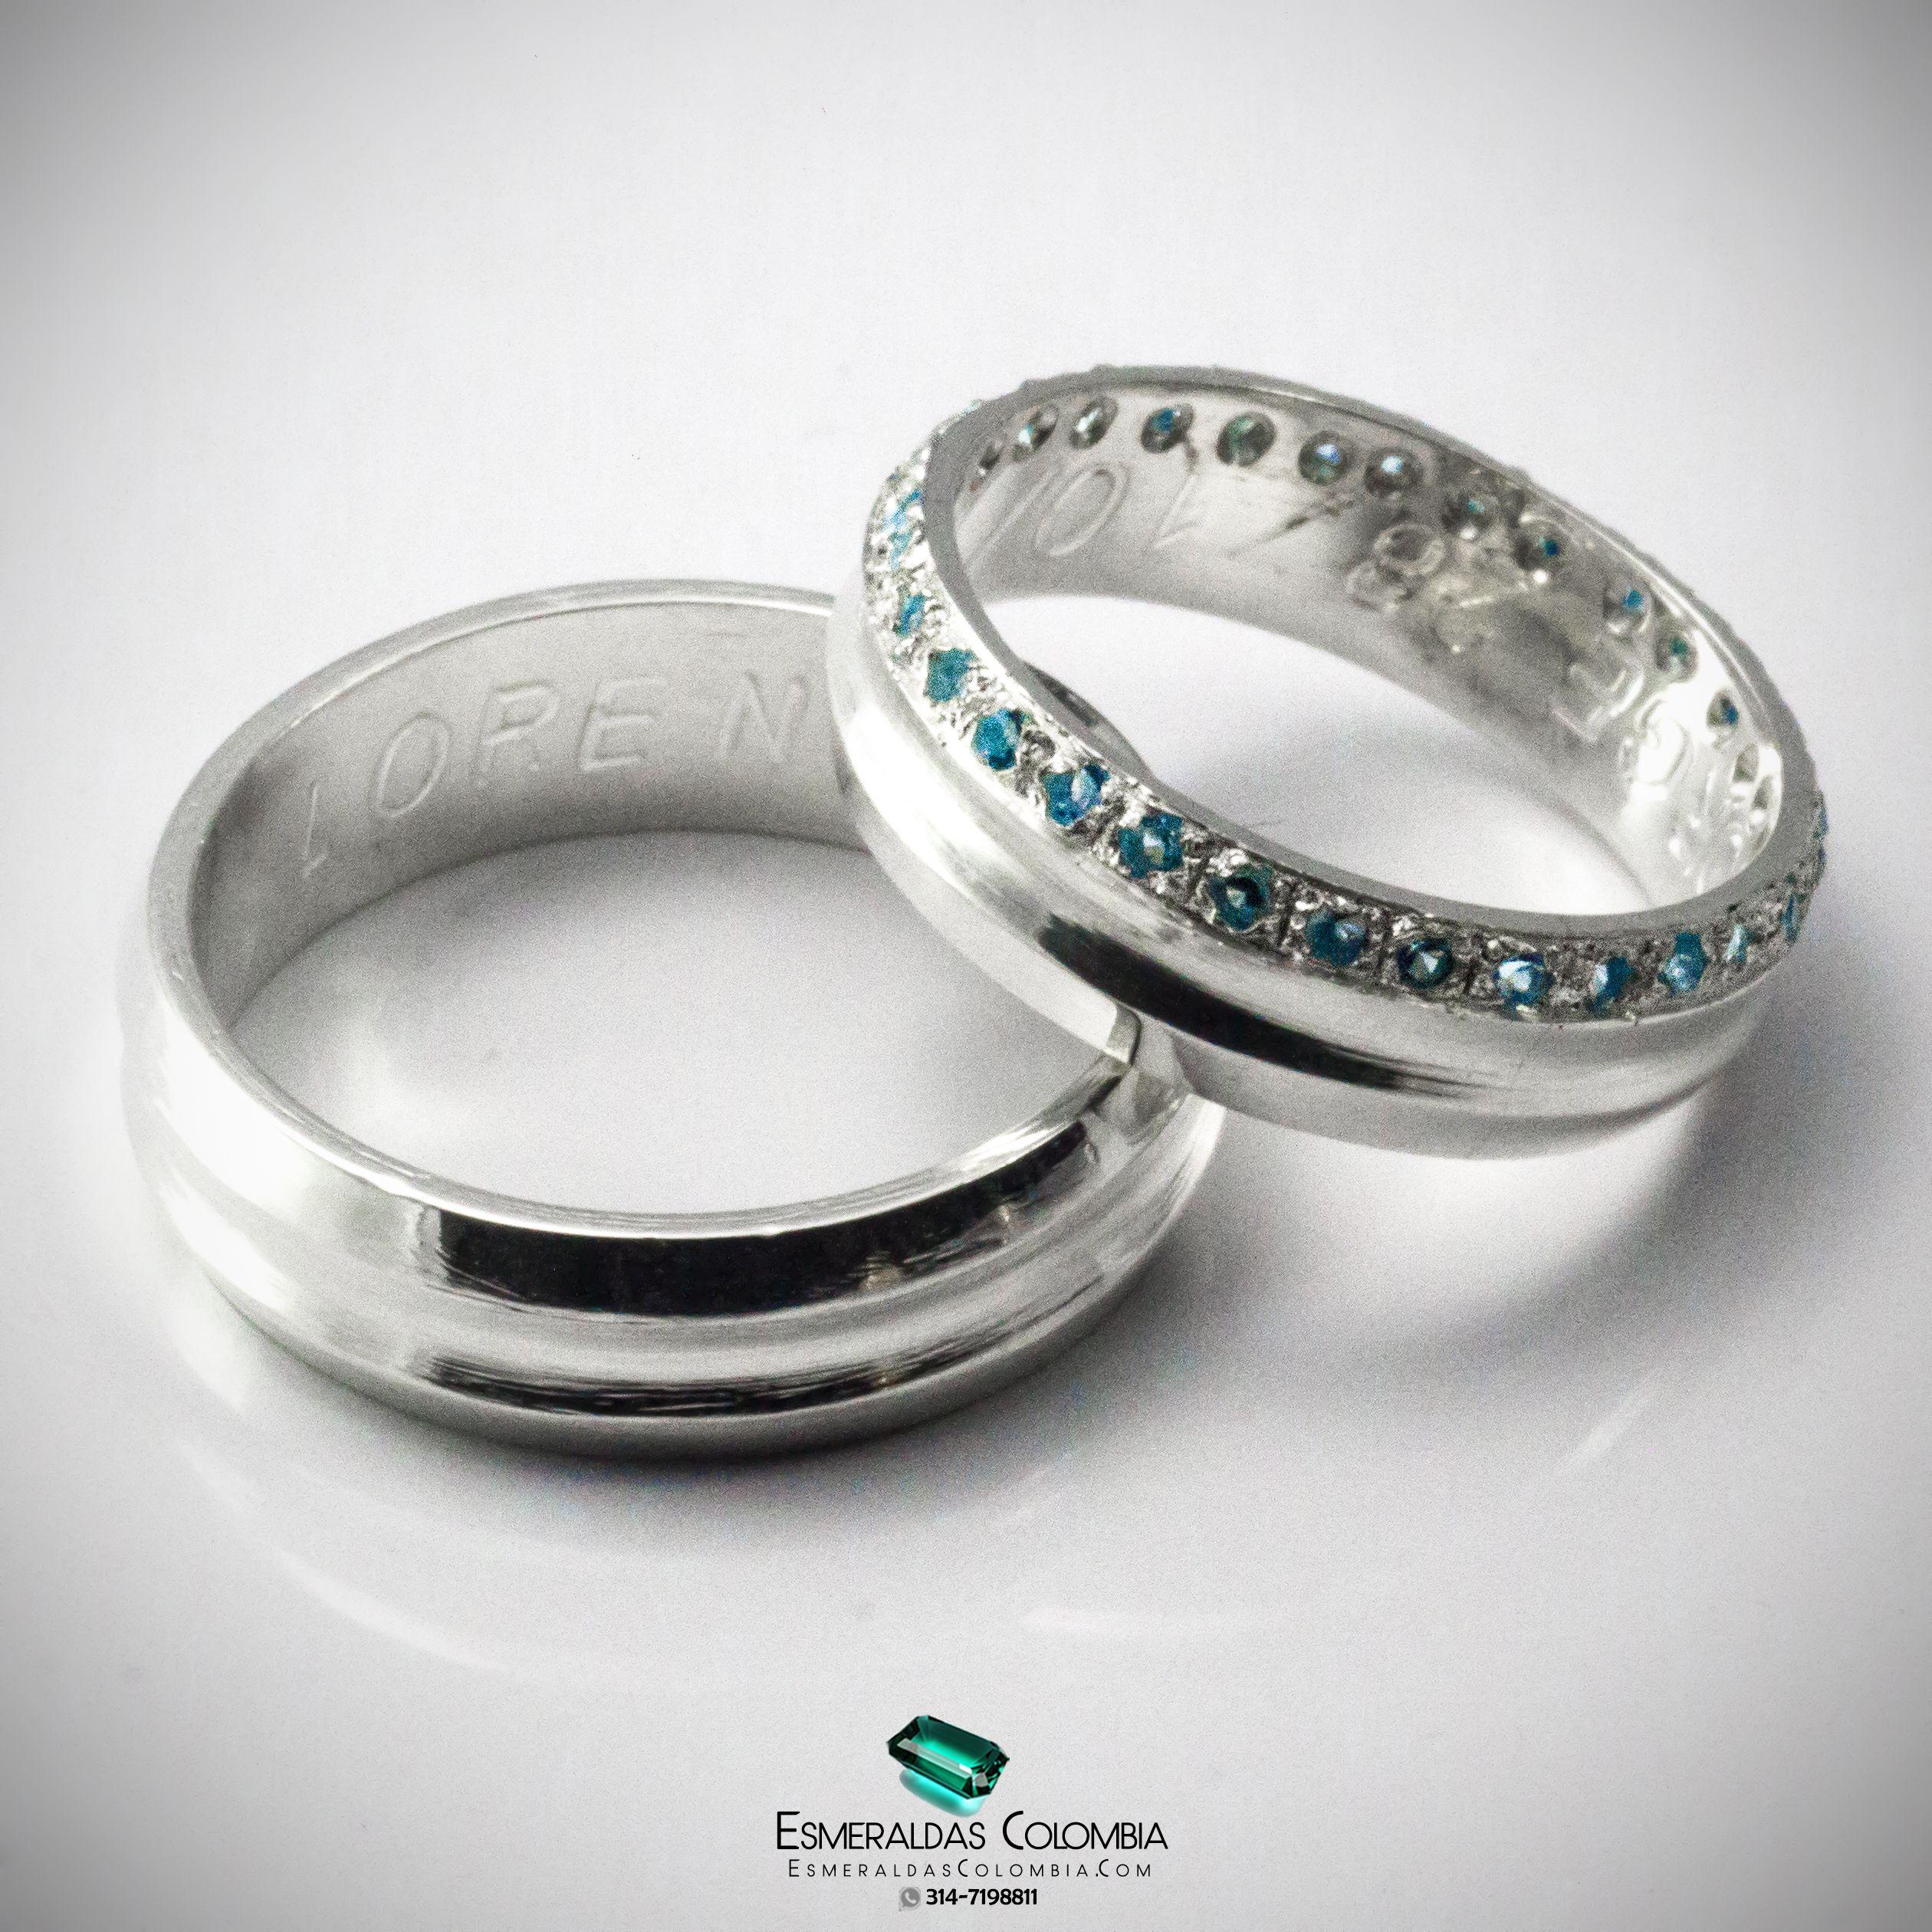 f1118cd05e89 Argollas de Matrimonio en Oro 18k o Plata con Diamante sintético o  Esmeralda Colombiana  esmeraldascolombia Facebook   esmeraldascolombia  Instagram    ...